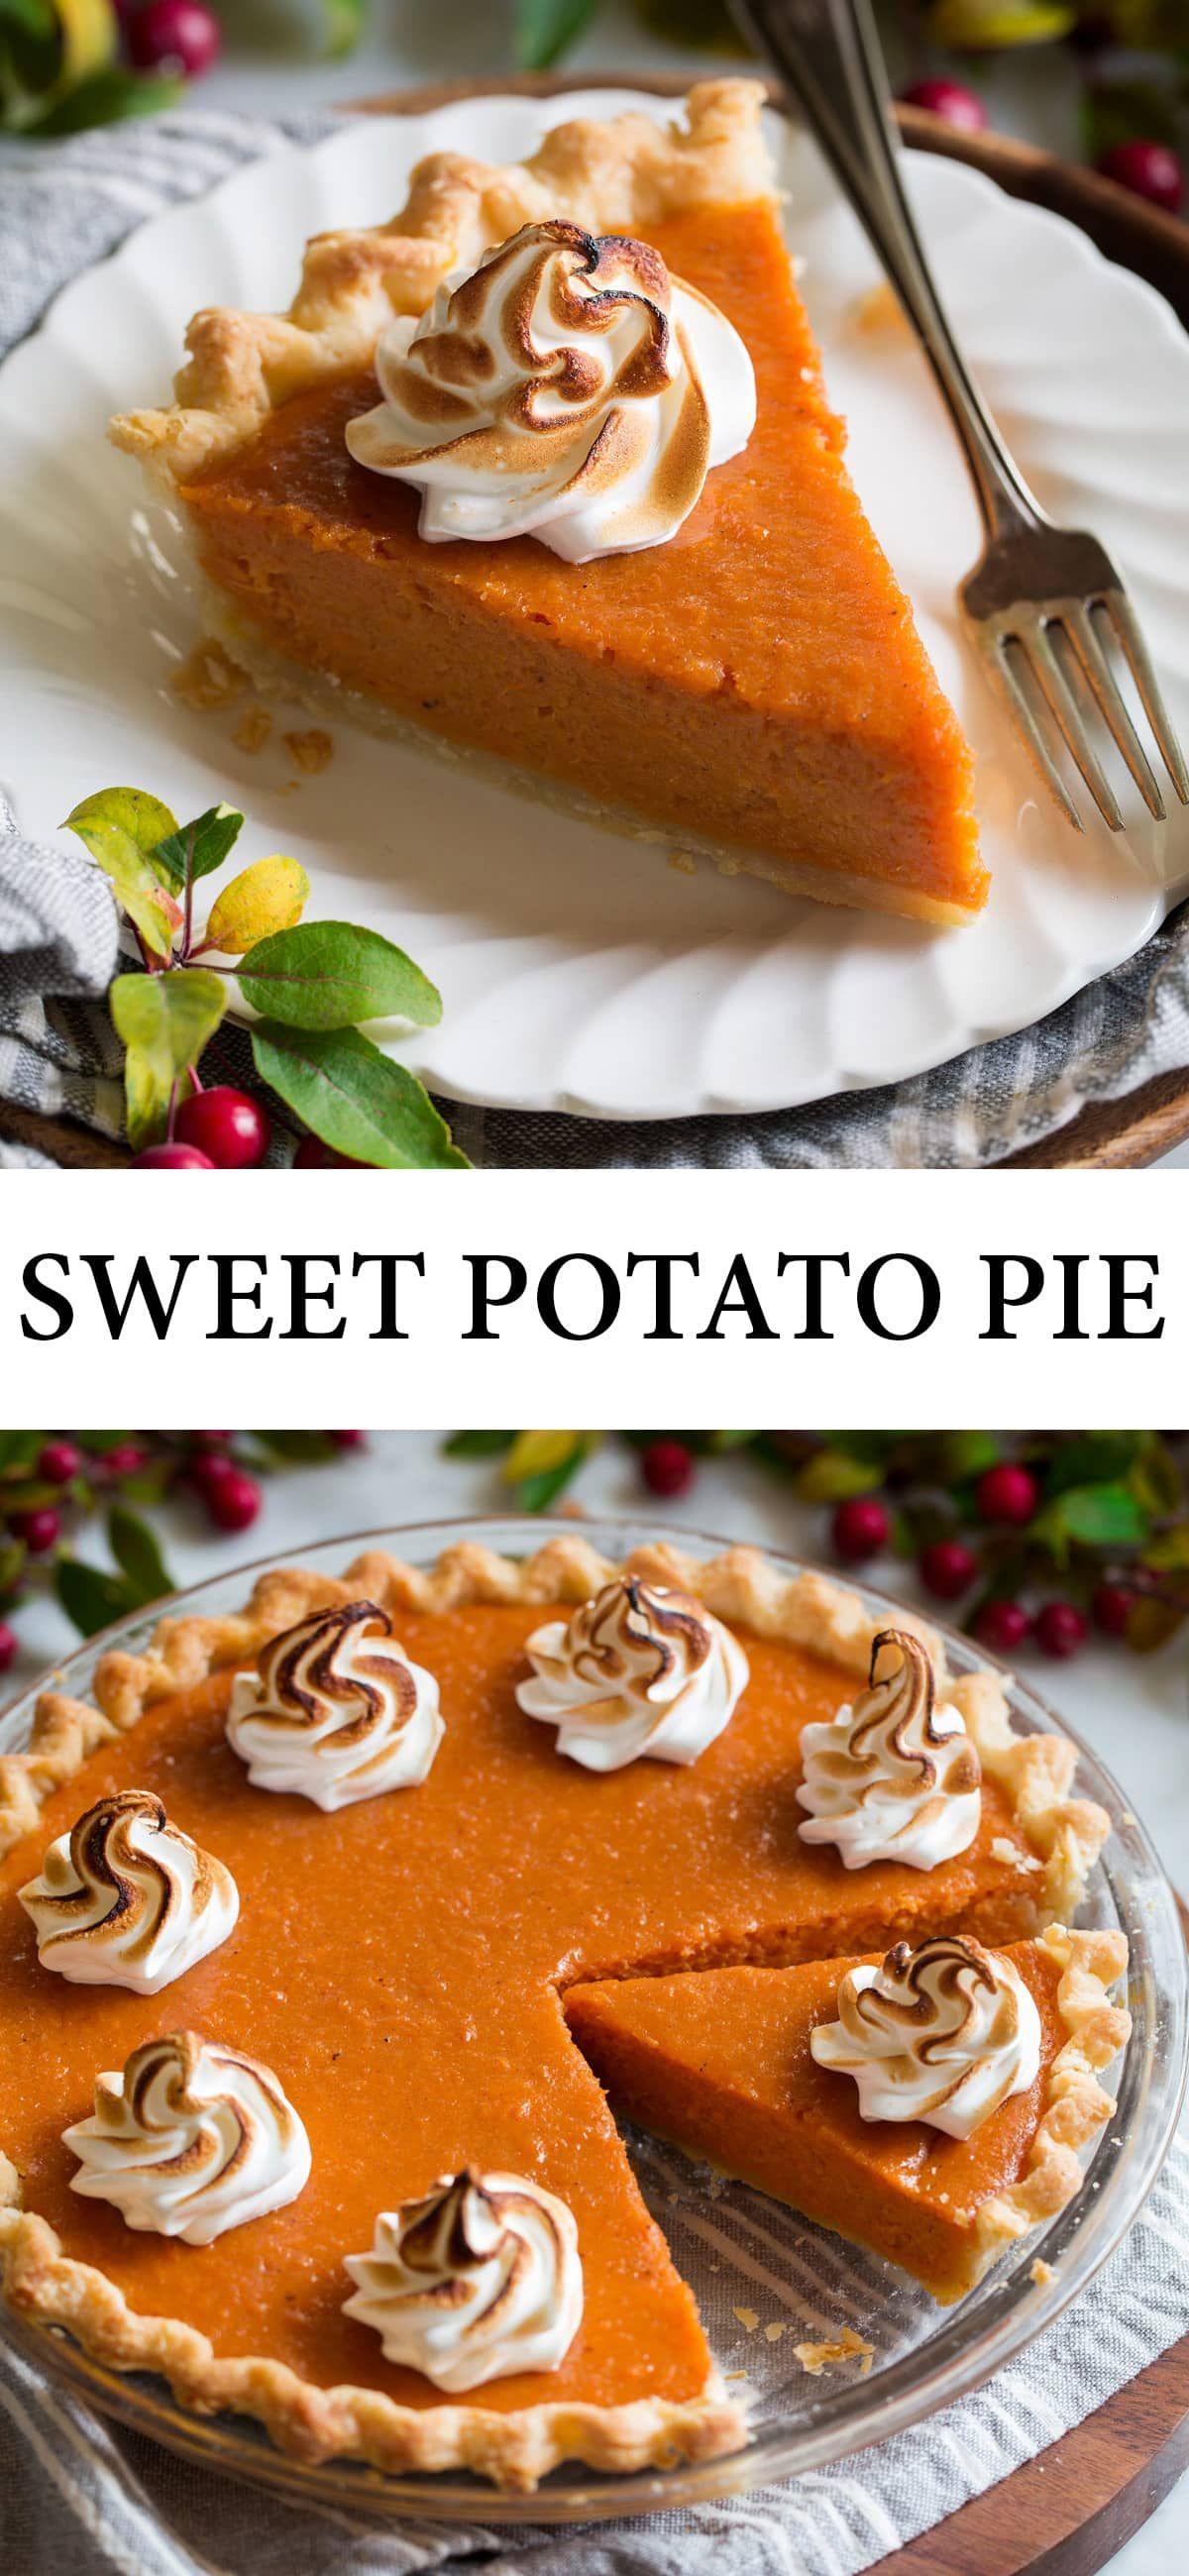 Sweet Potato Pie Recipe - Cooking Classy